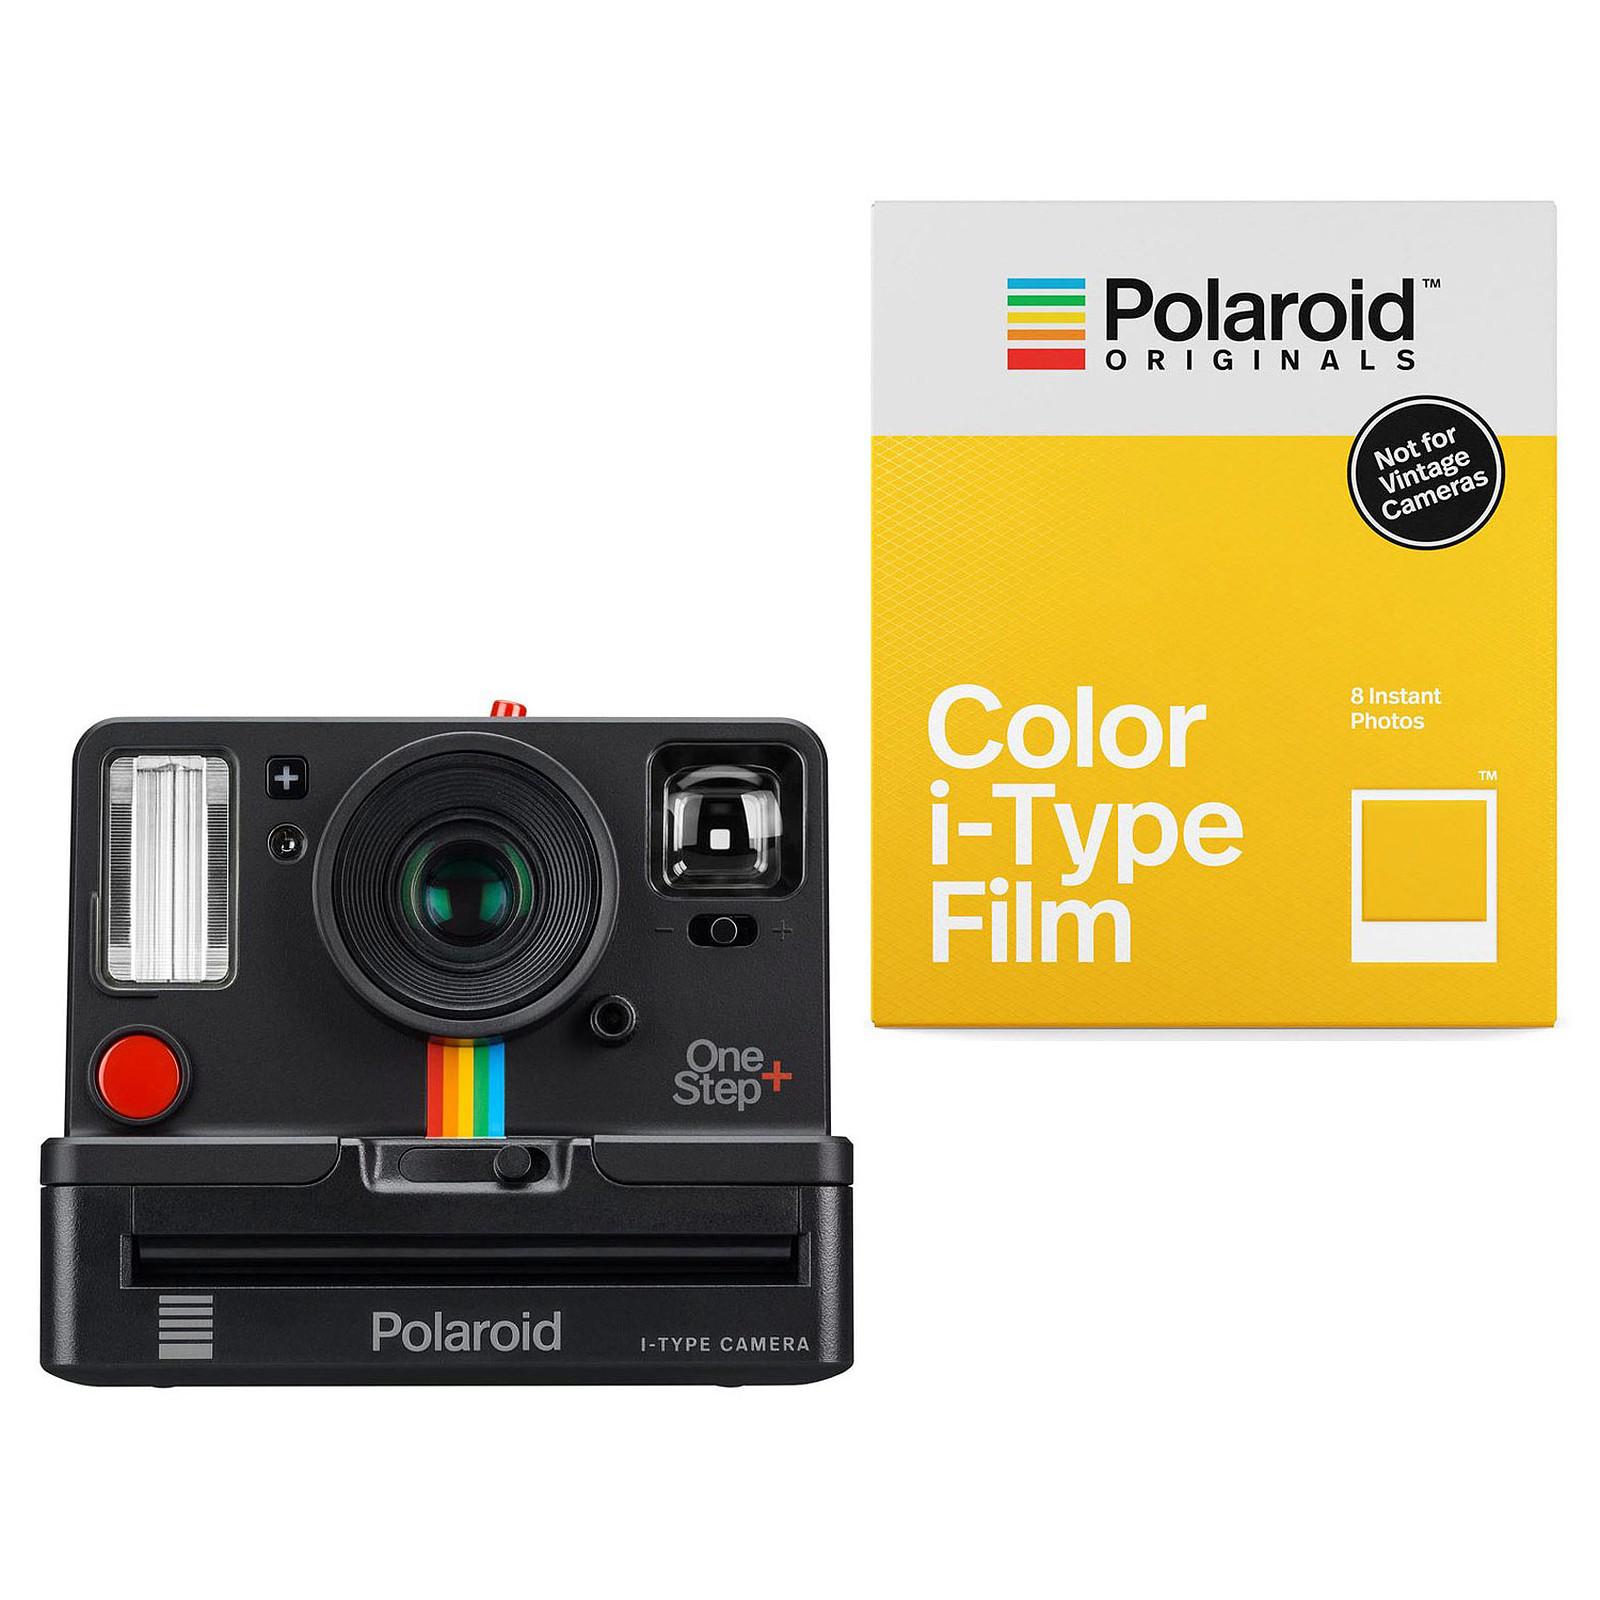 Polaroid OneStep+ Noir + Color i-Type Film